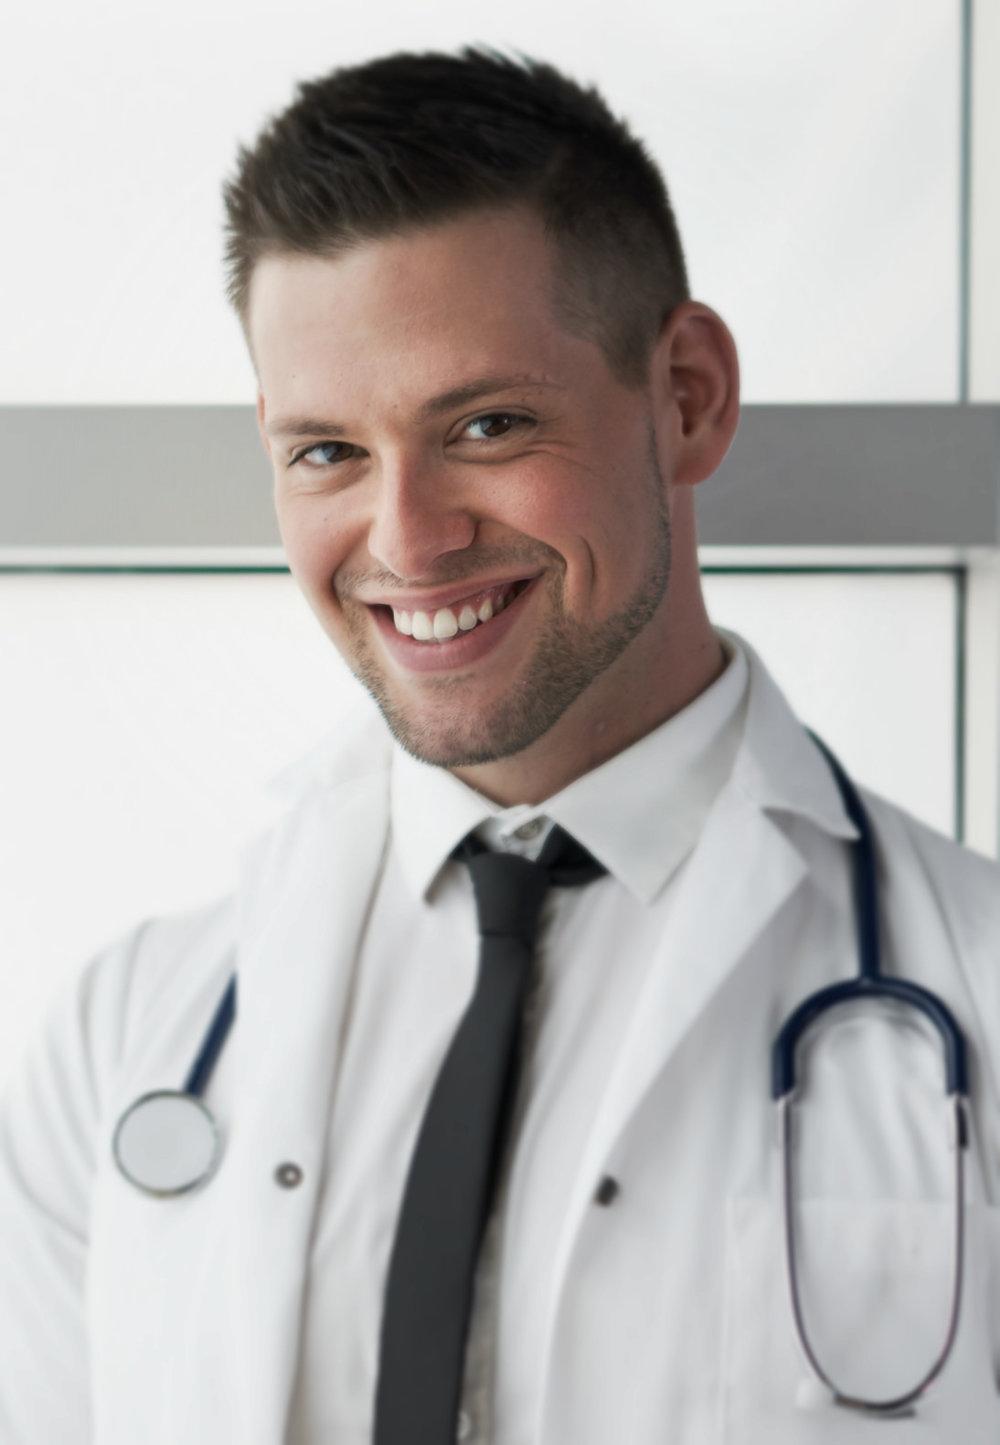 Handsome Hispanic Doctor Male